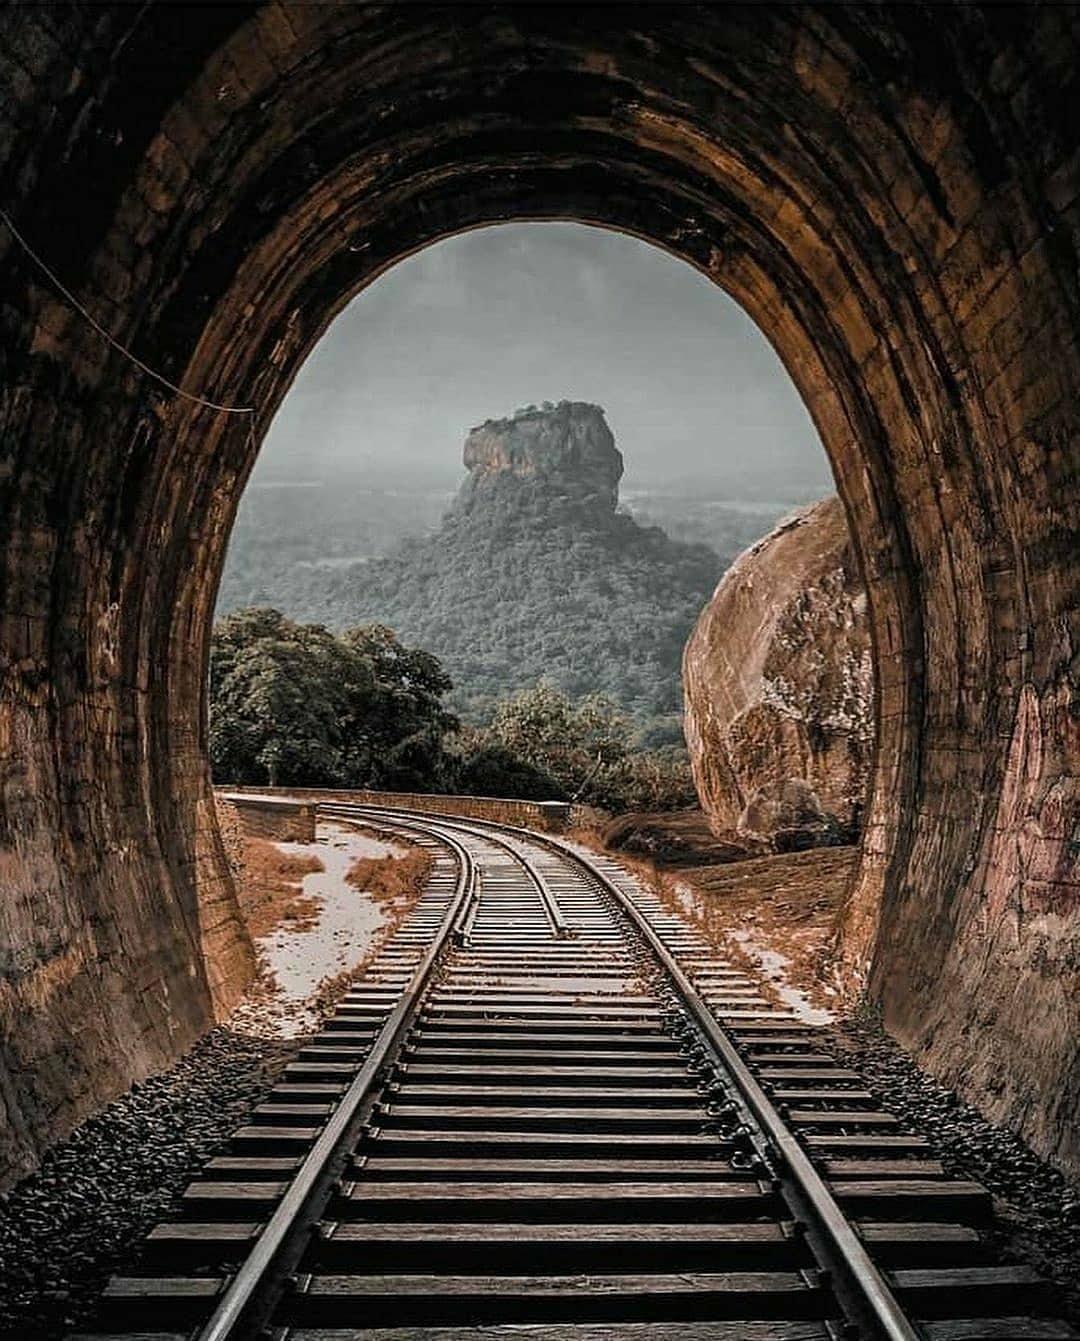 Sigiriya - The Most Amazing Ancient Rock Fortress In Sri Lanka